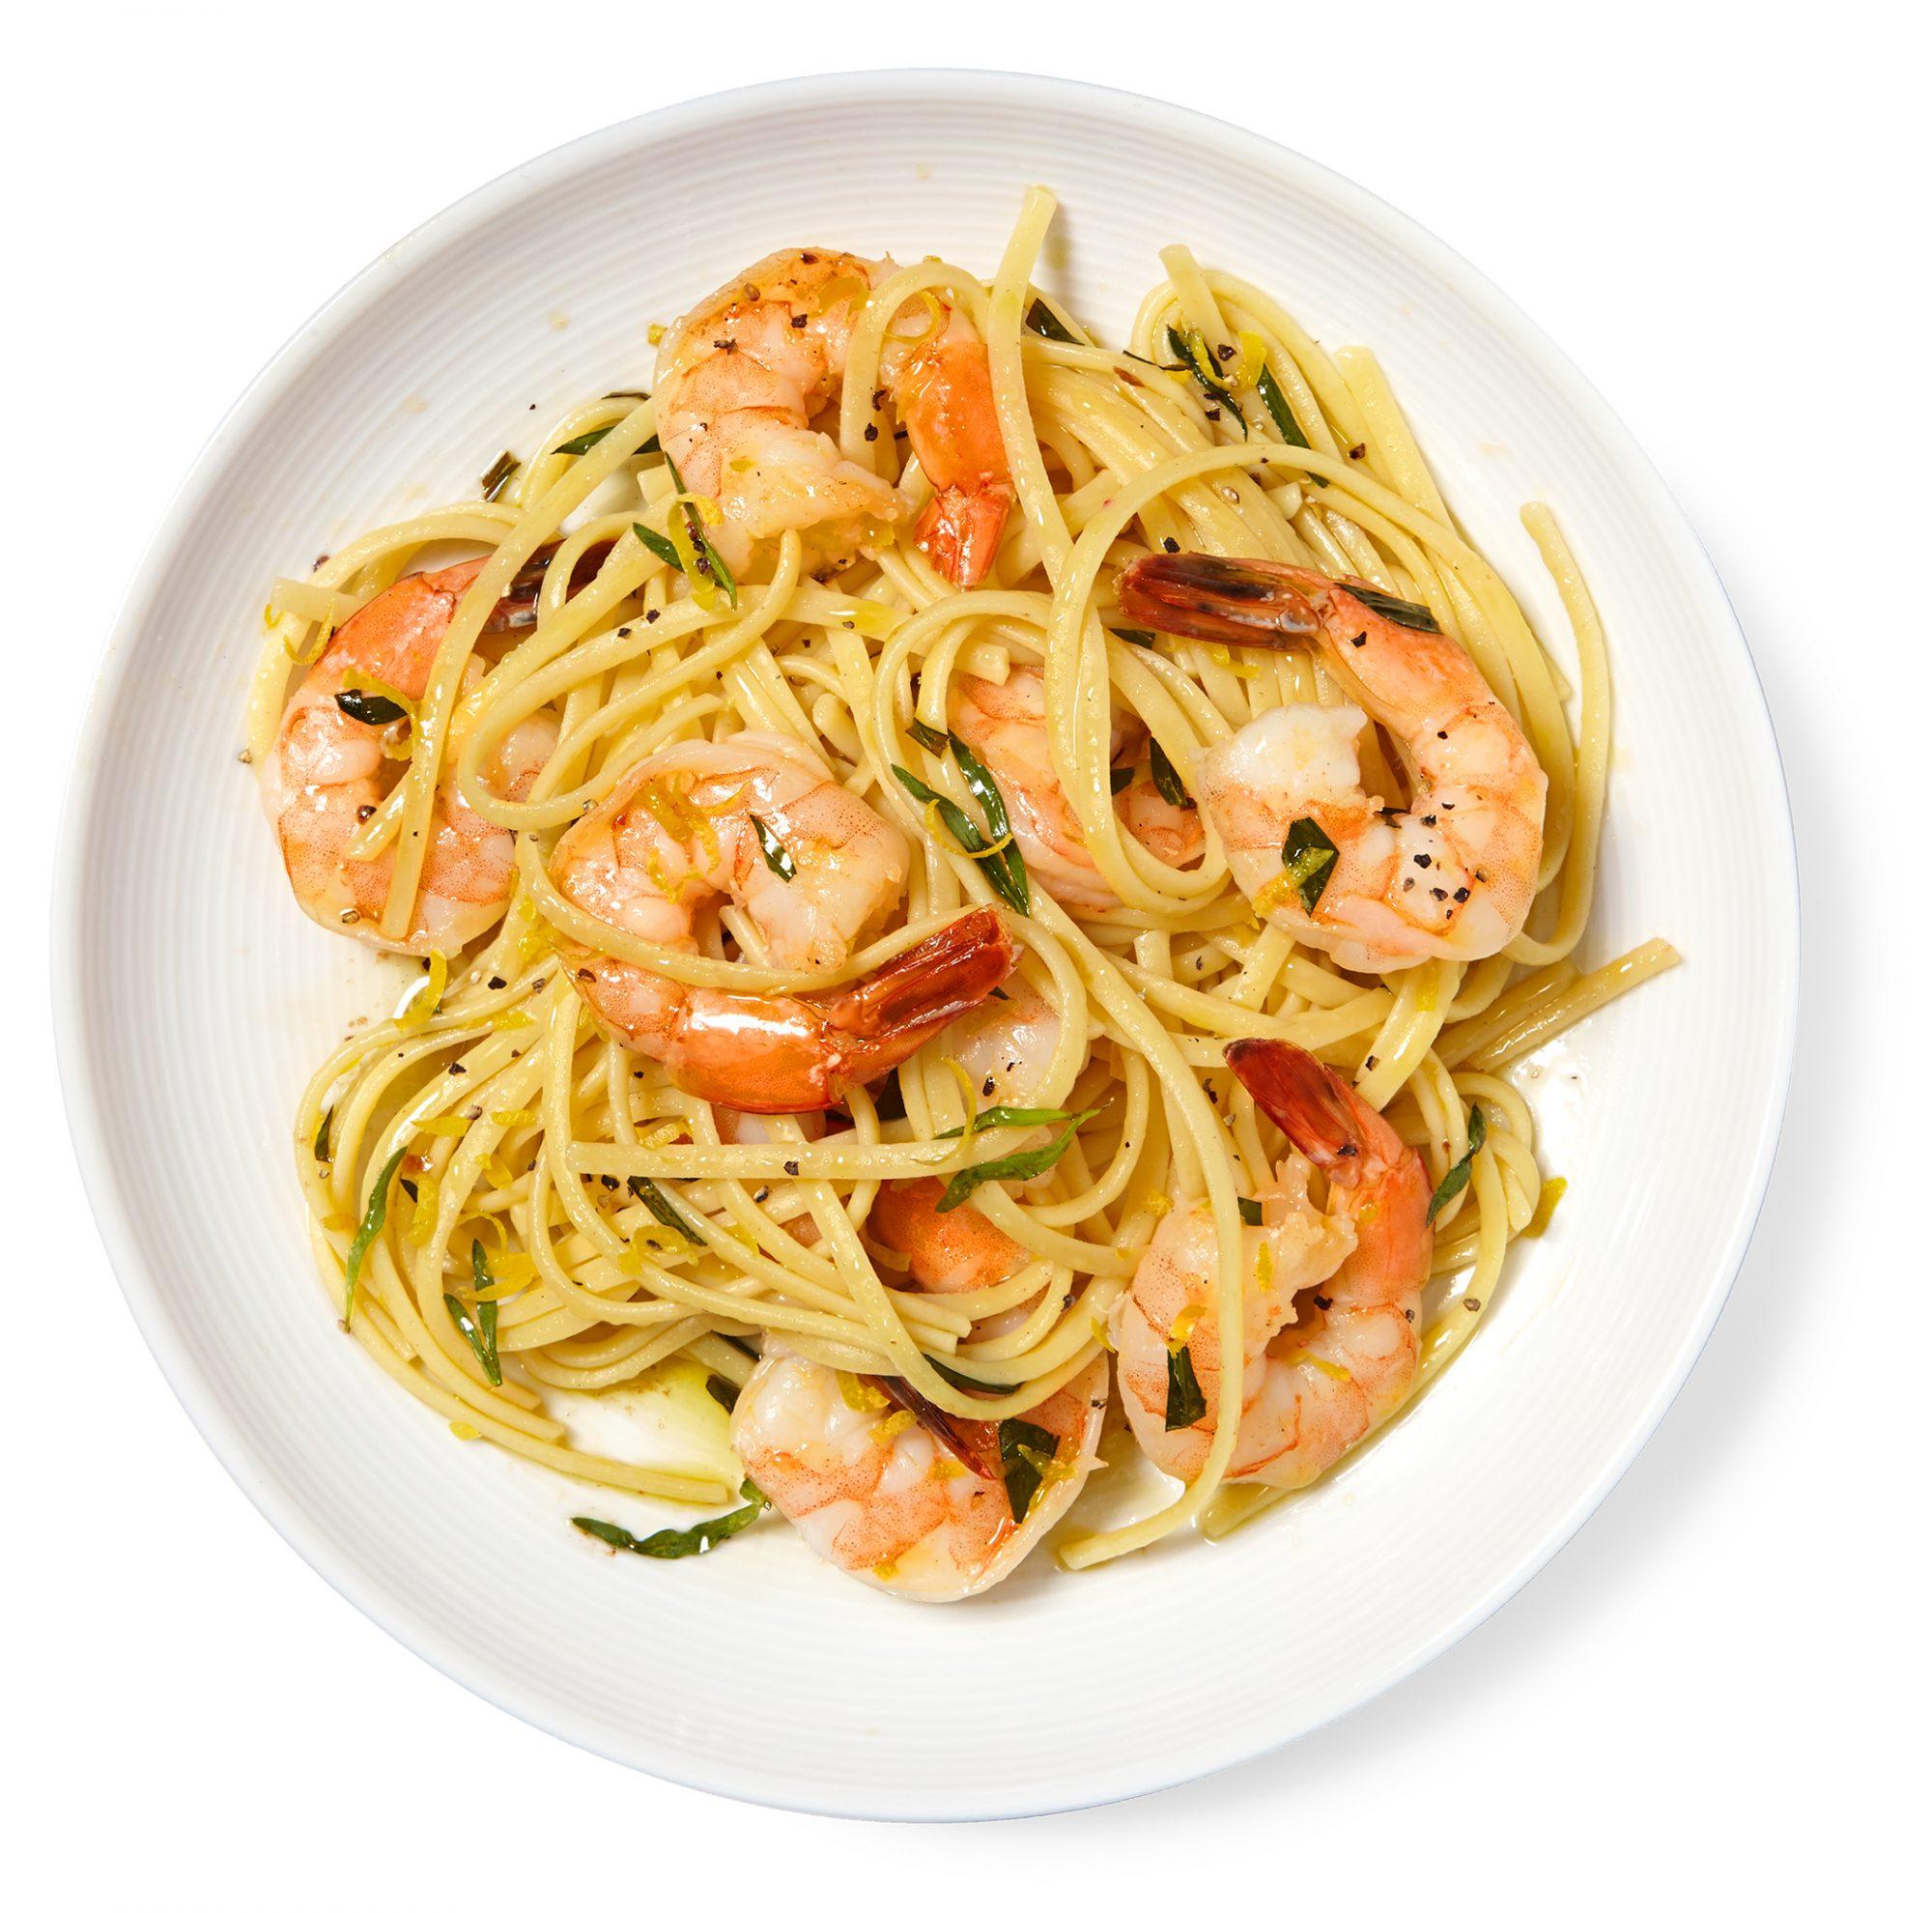 Lemon-Tarragon Shrimp Pasta